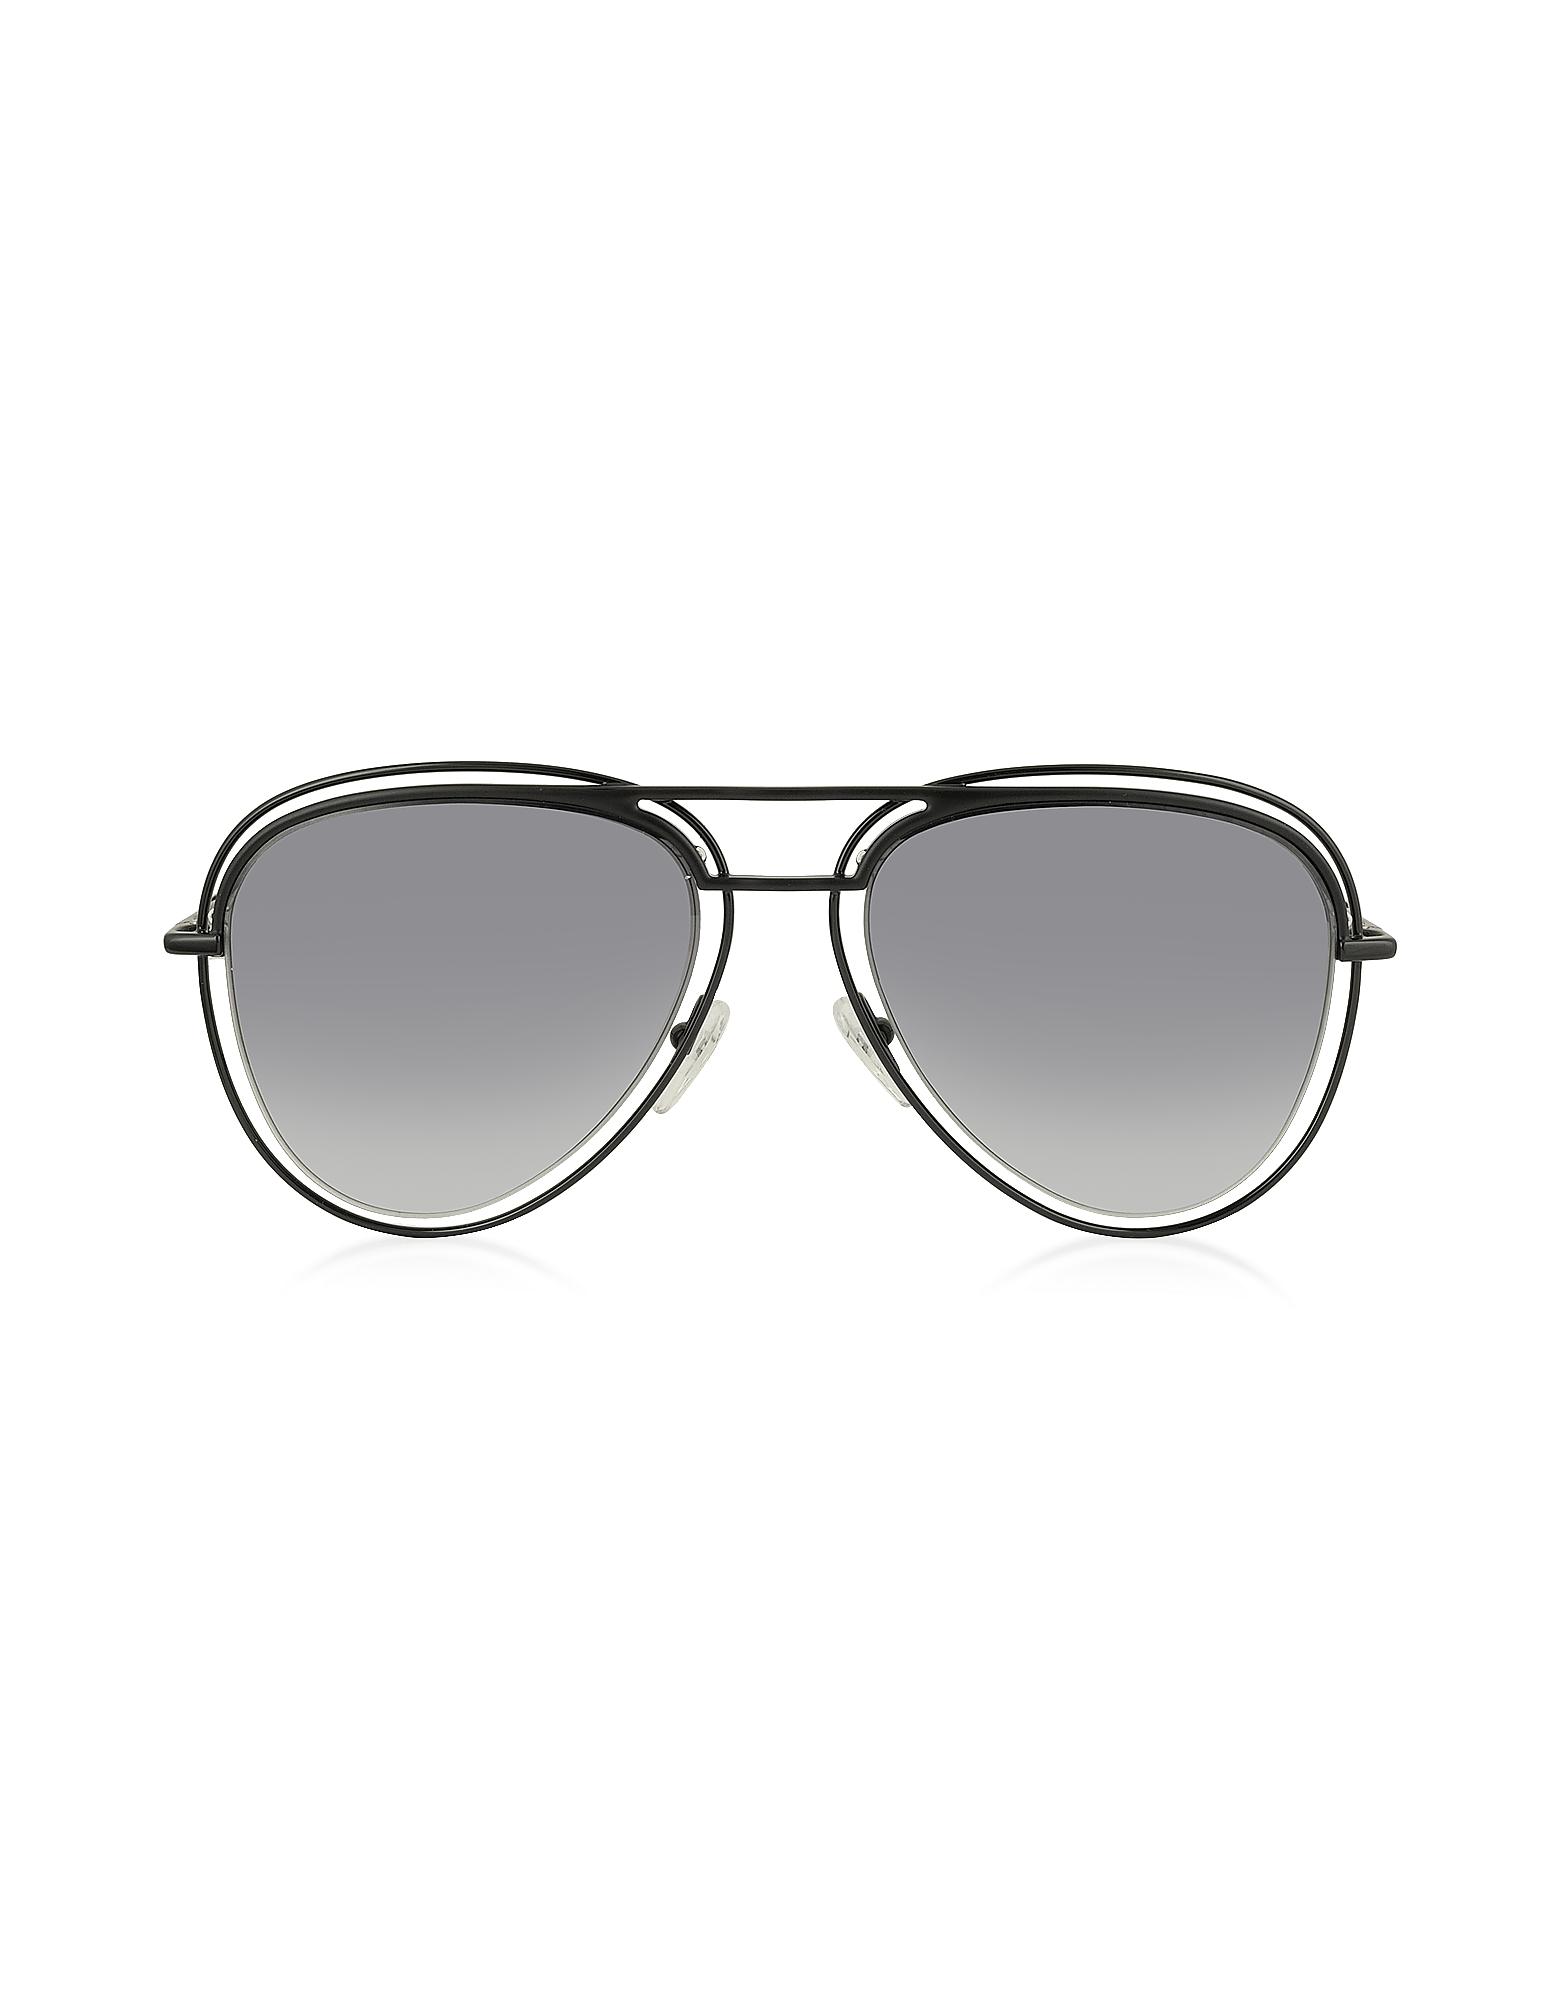 Marc Jacobs Designer Sunglasses, MARC 7/S Metal & Acetate Aviator Women's Sunglasses